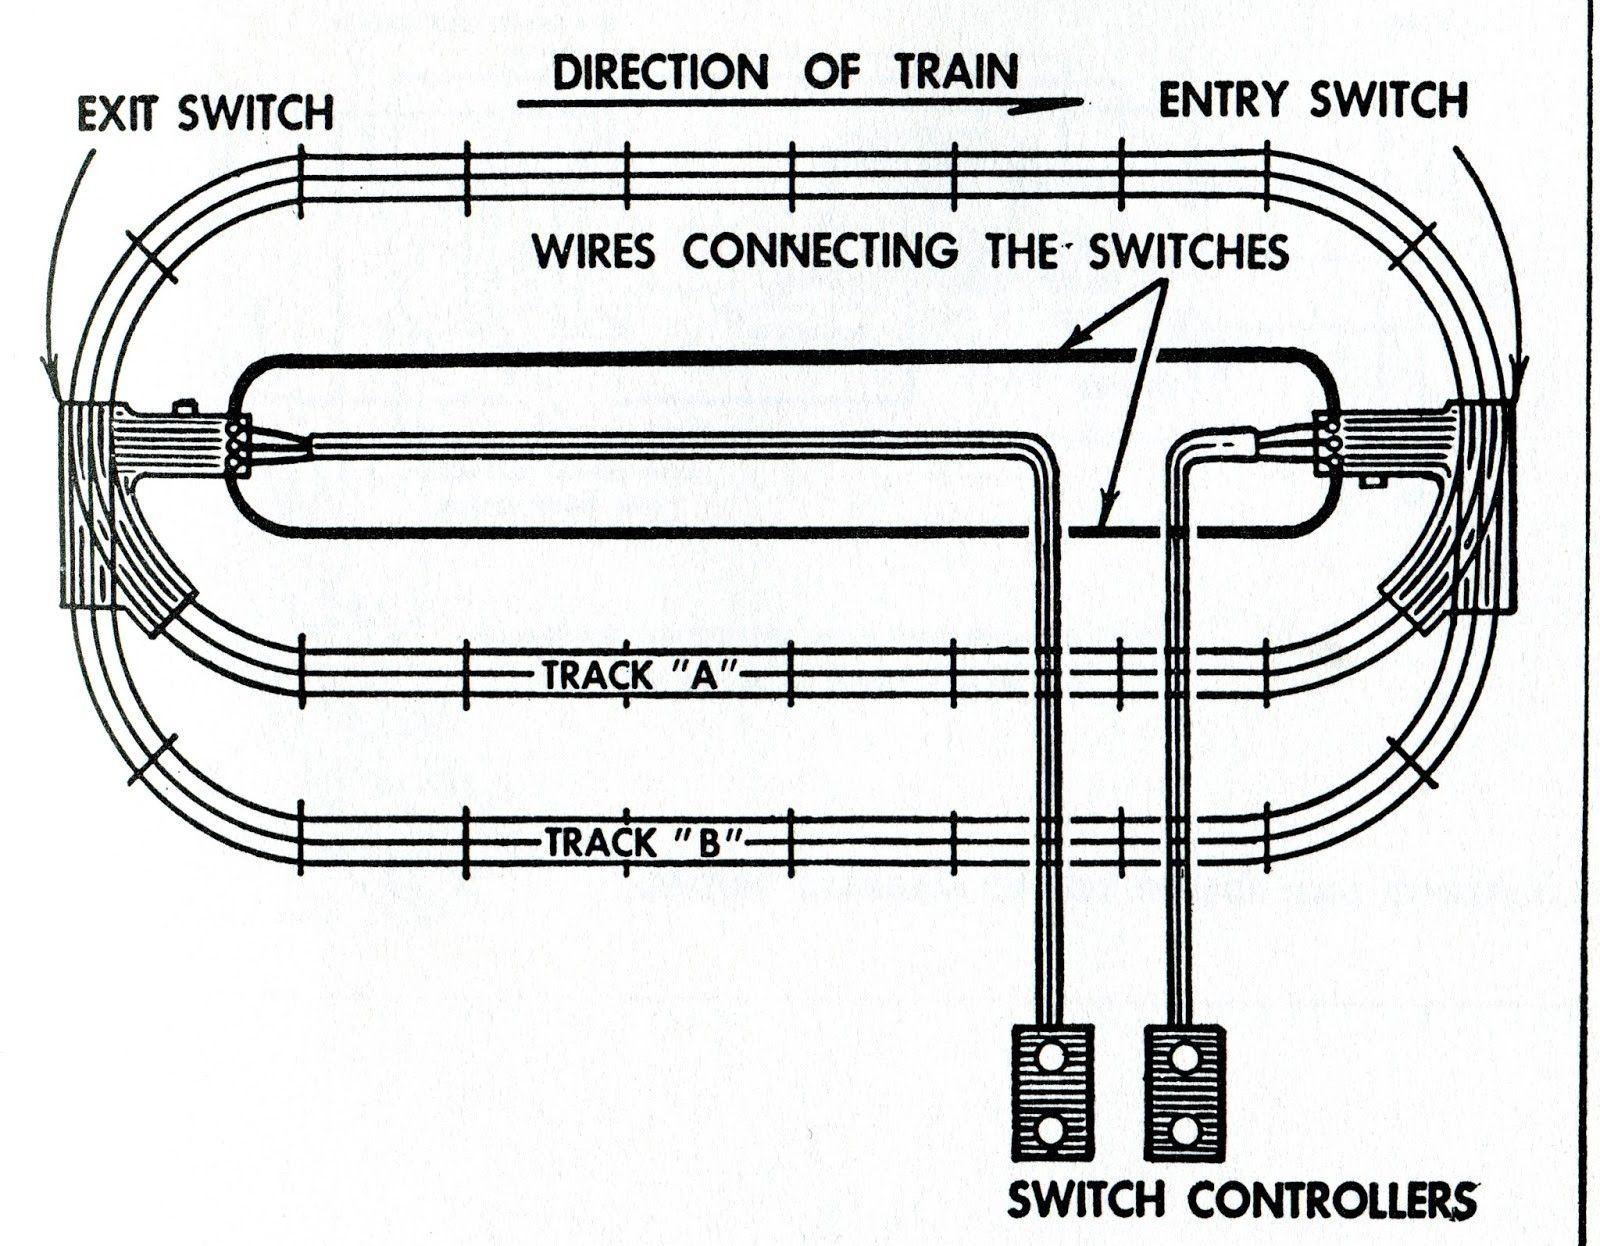 Lionel Train Wiring Guide In 2020 Lionel Trains Model Train Layouts Model Train Sets